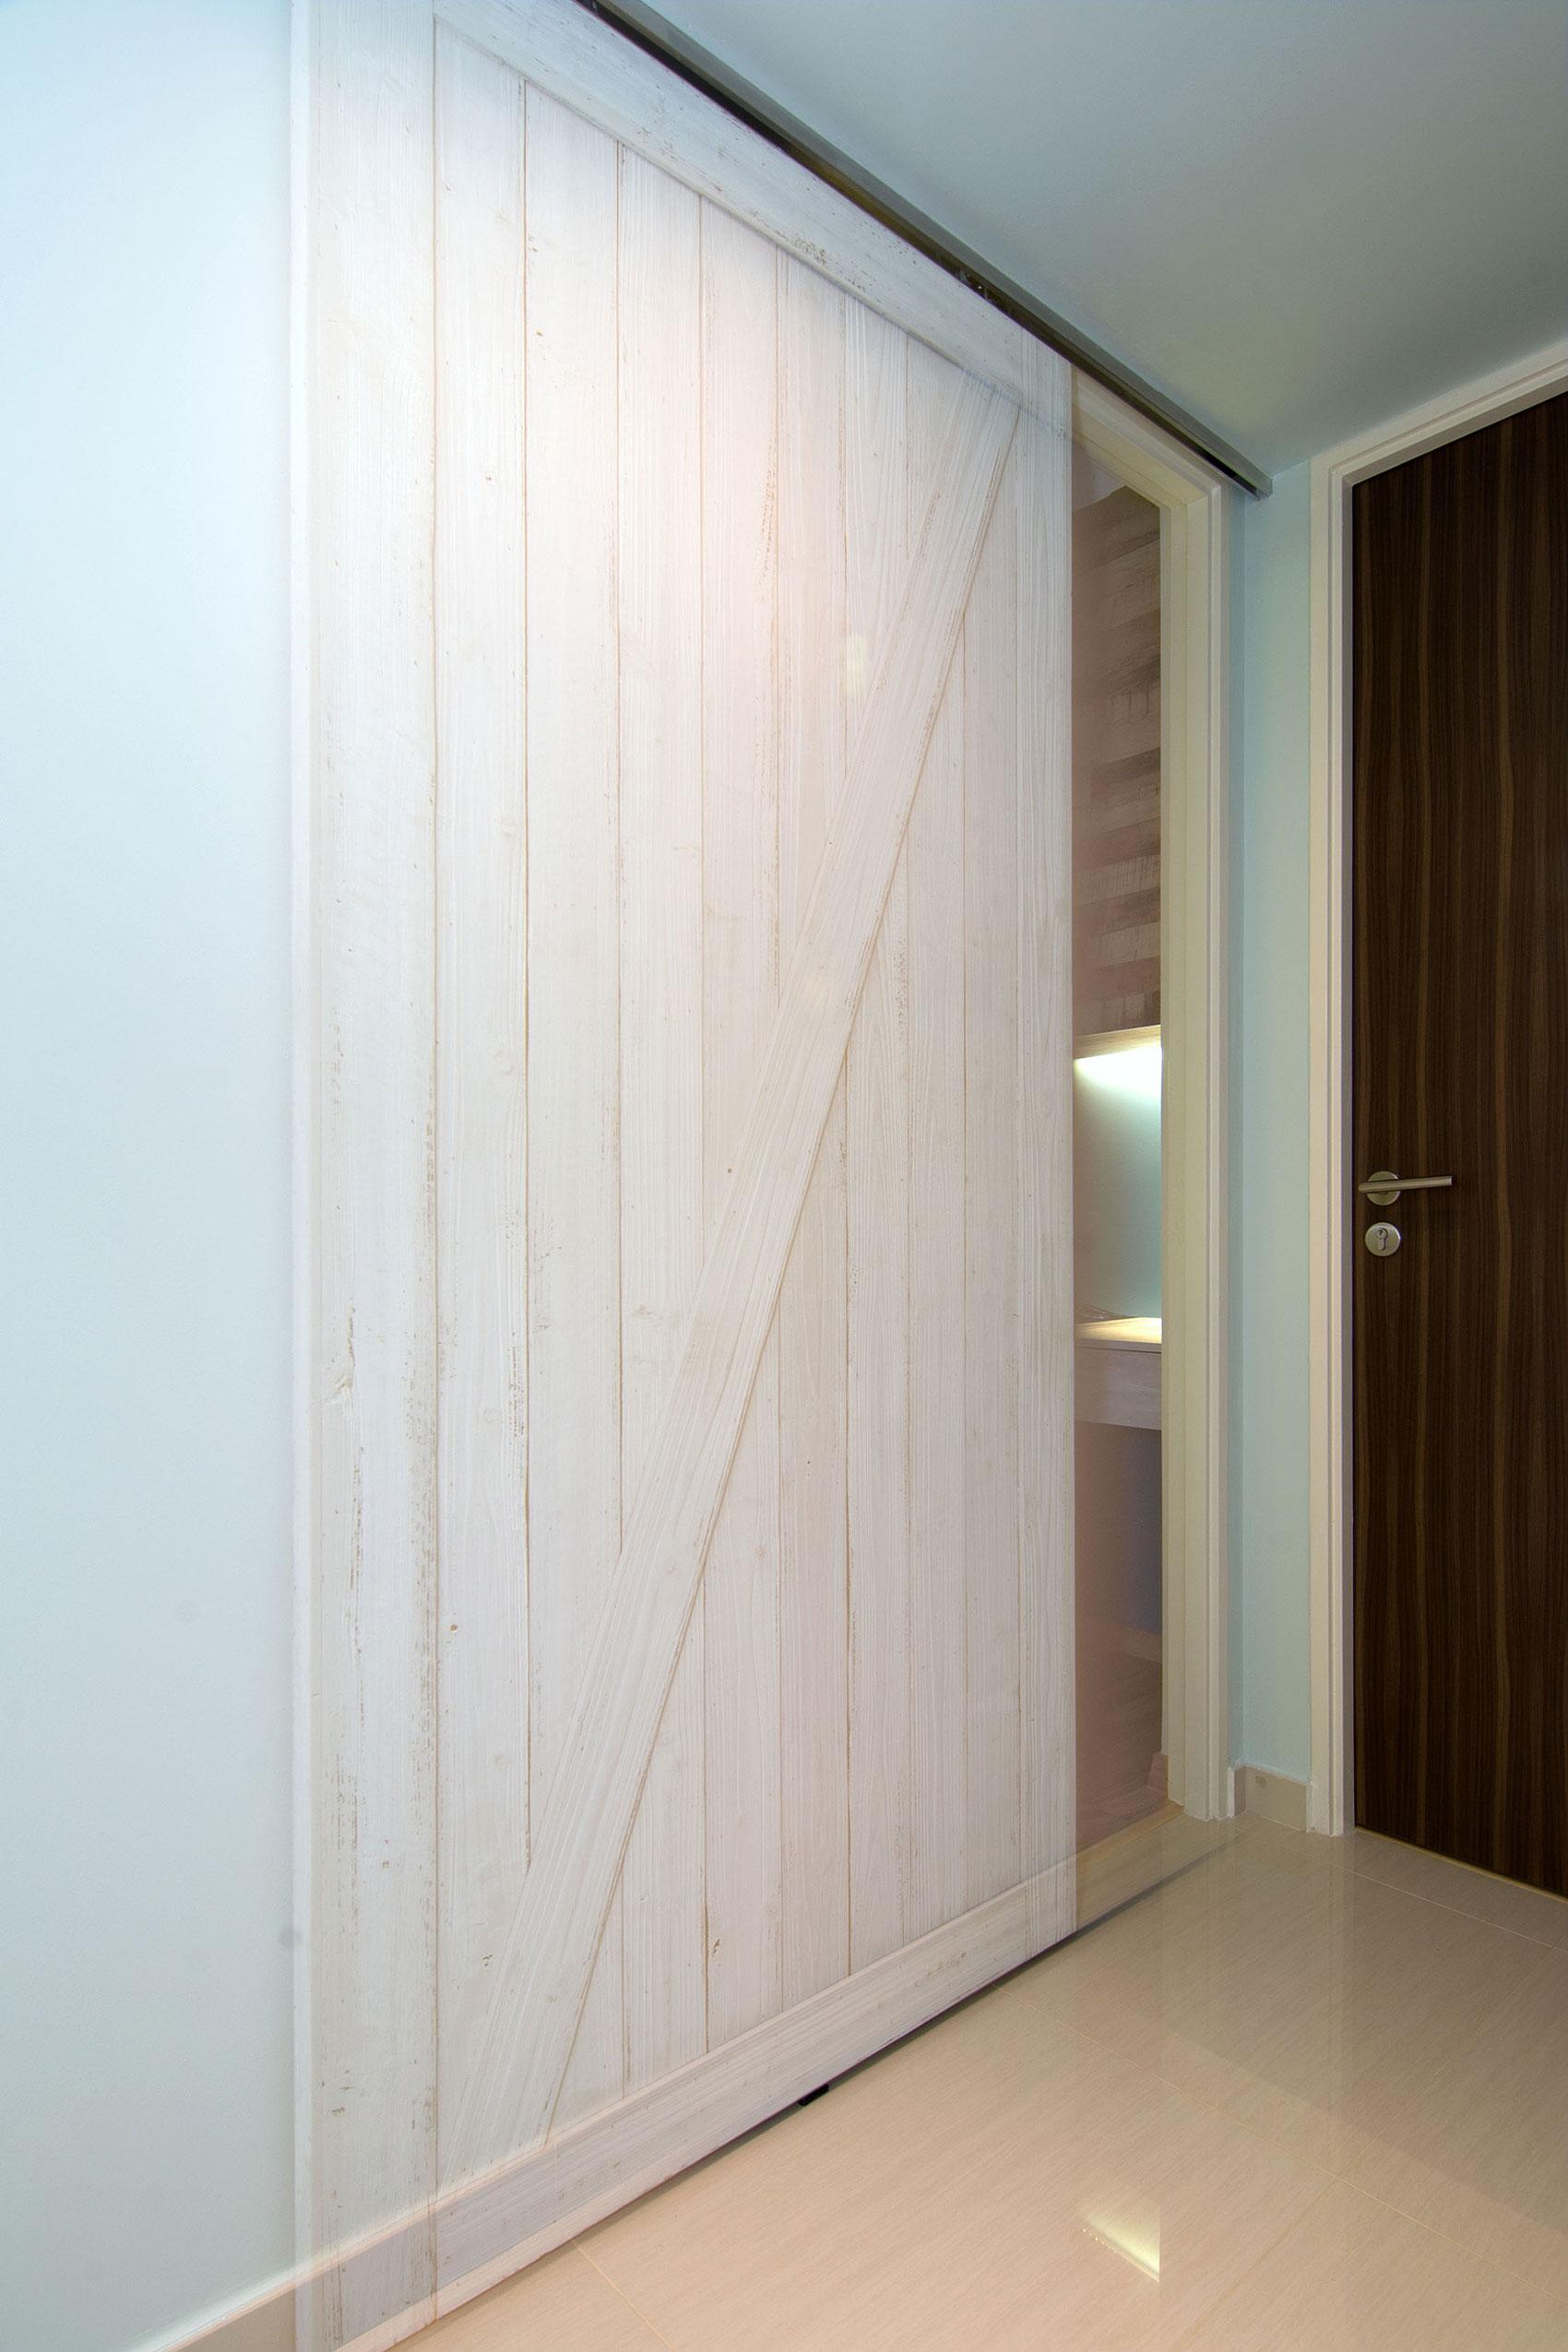 Beach house urban apartment in Singapore by Vievva Designers-13